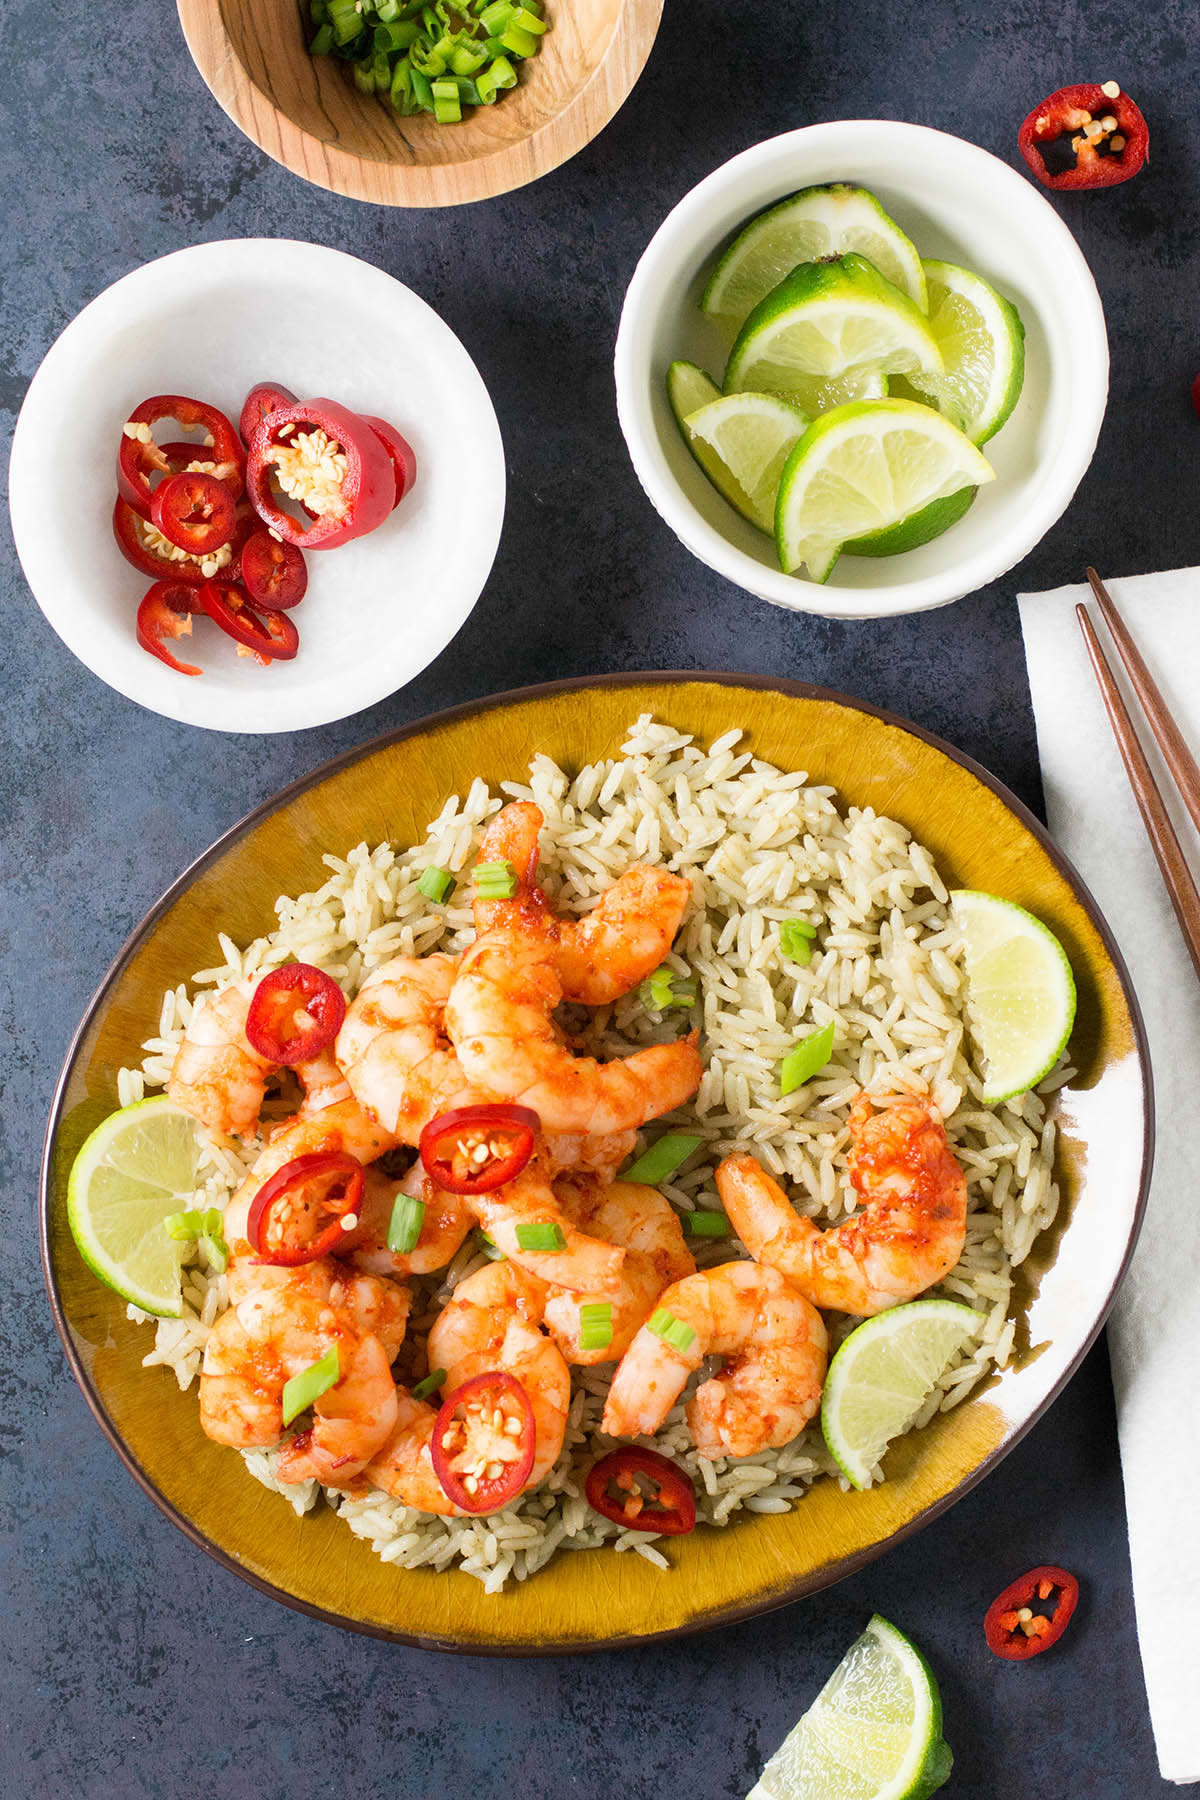 Chili-Garlic Shrimp with Thai Lime Rice - Recipe